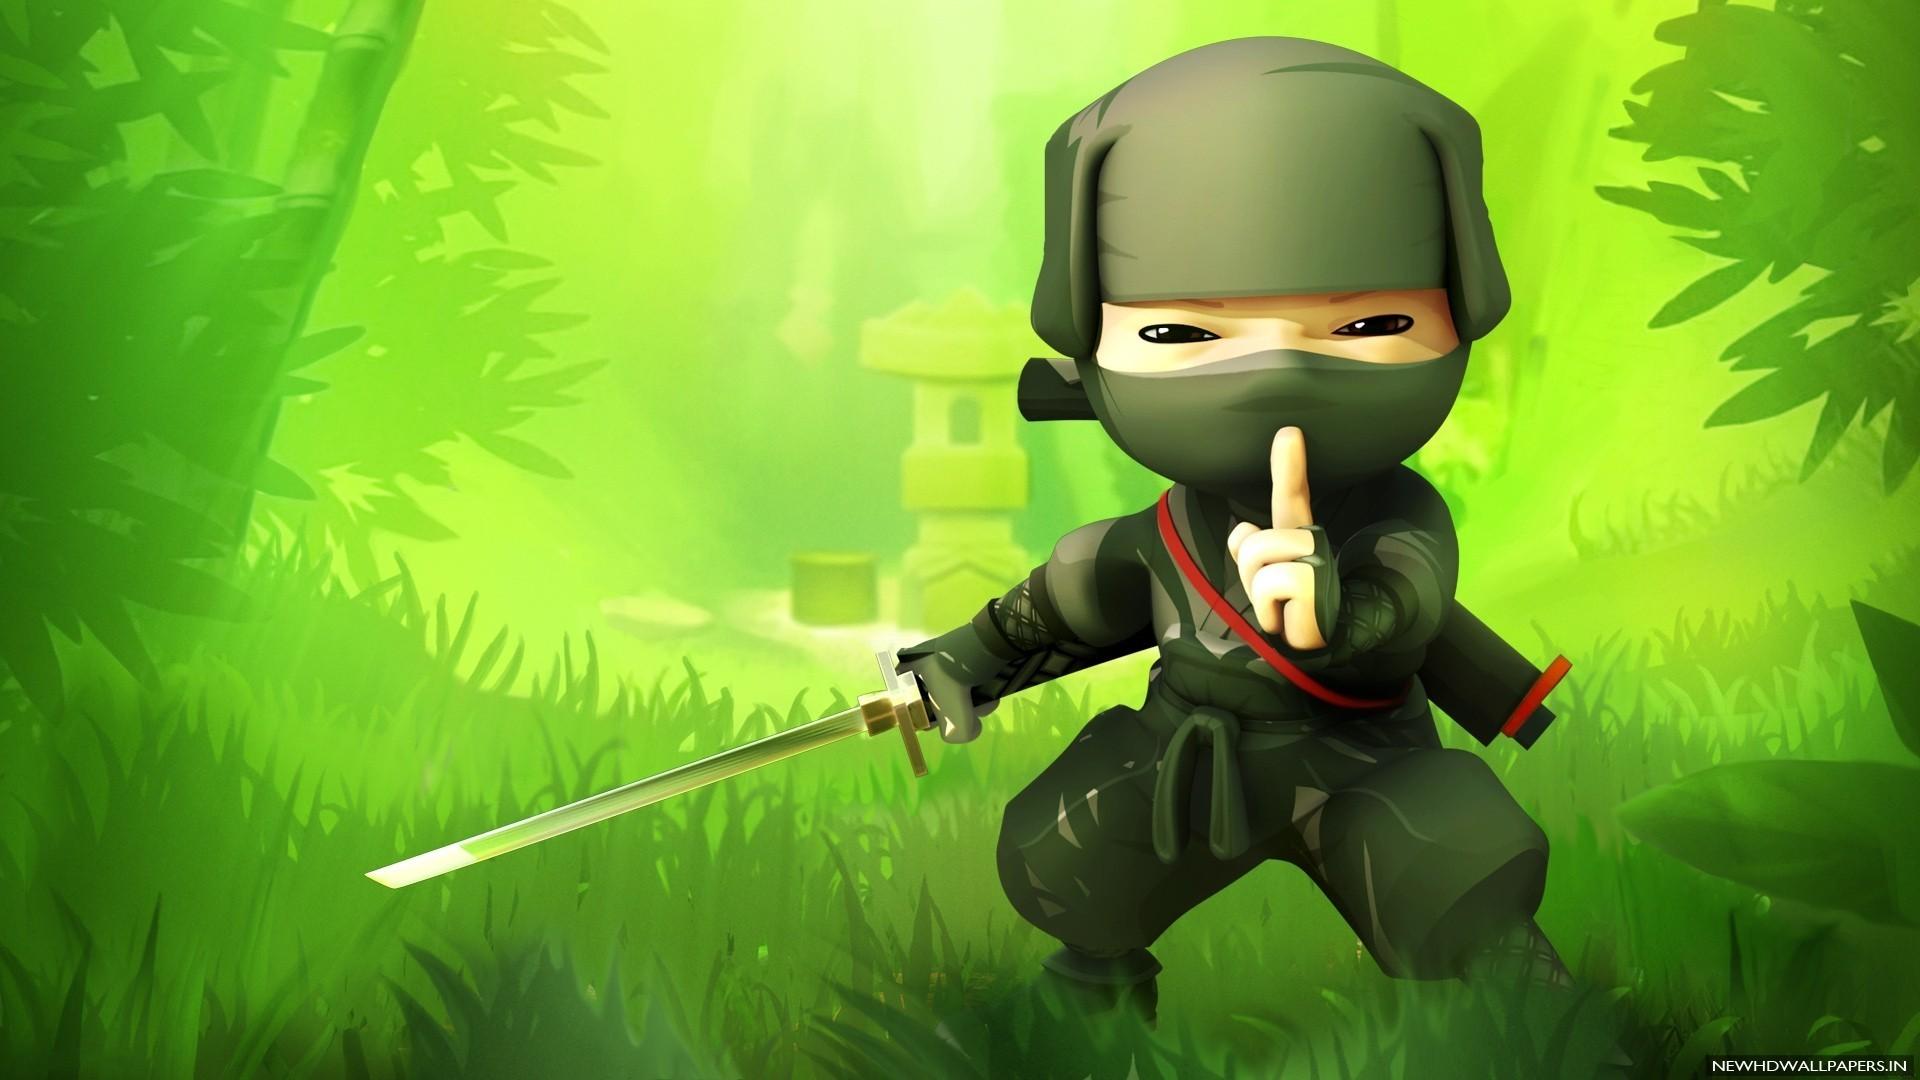 Ninja Cartoon Wallpapers | WallpapersIn4k.net